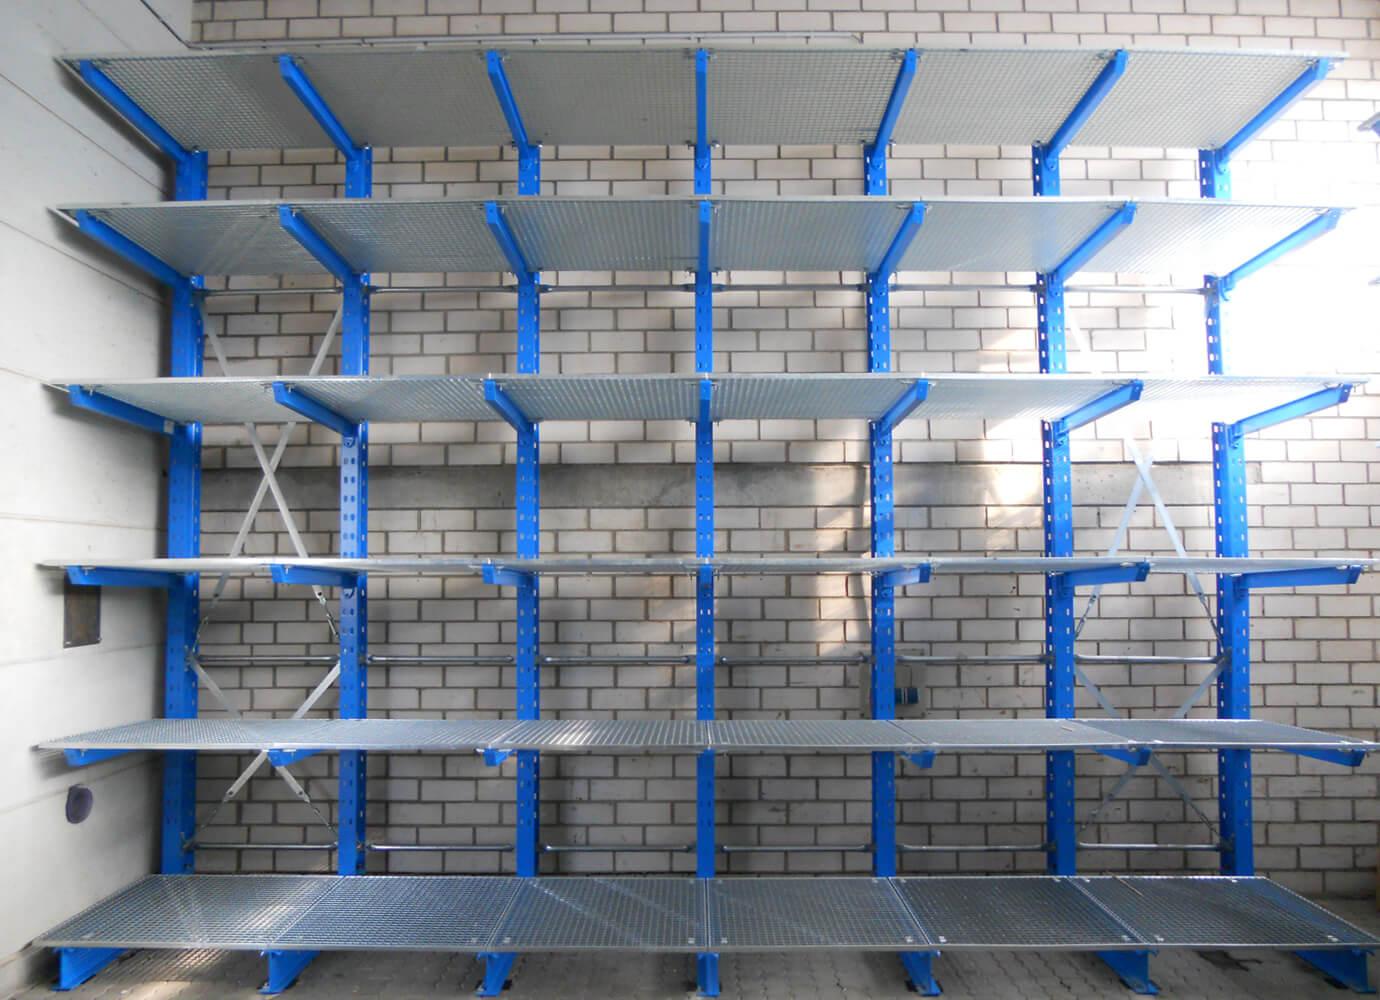 Neues Regalsystem Fur Konstruktionswerkstoffe Kvg Kunststoff